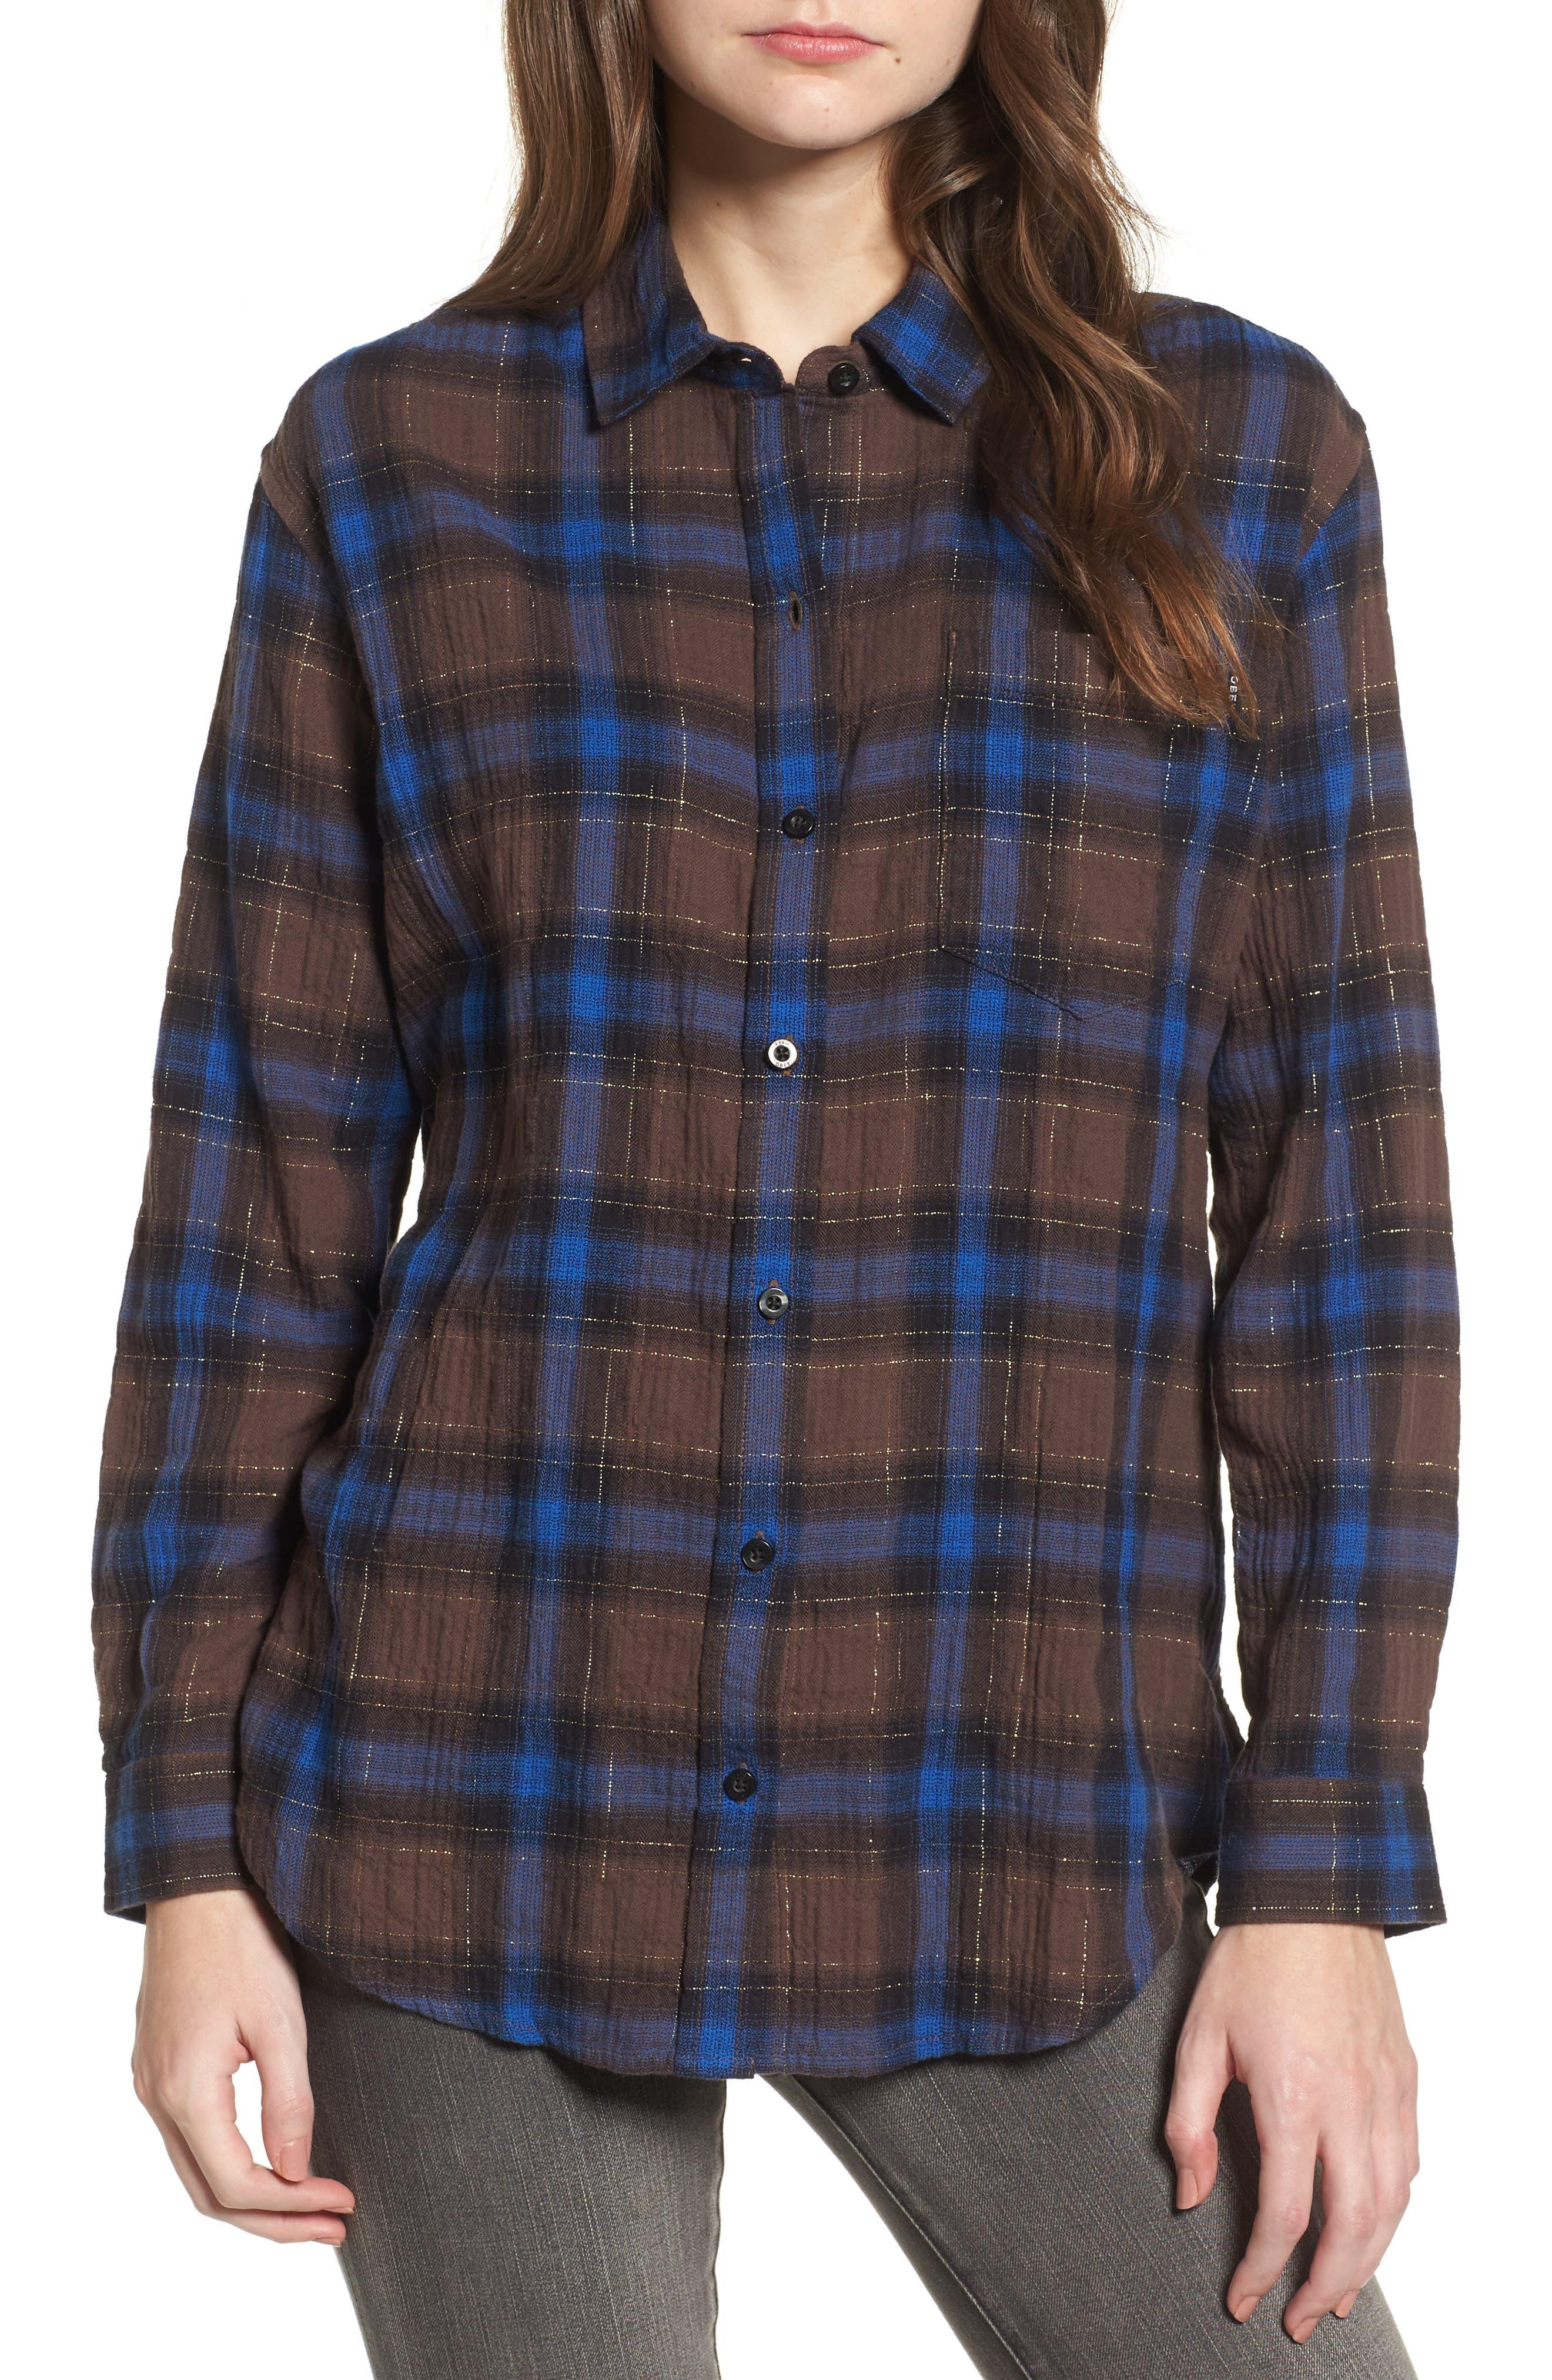 Eldorado Plaid Shirt,                             Main thumbnail 1, color,                             Brown Multi